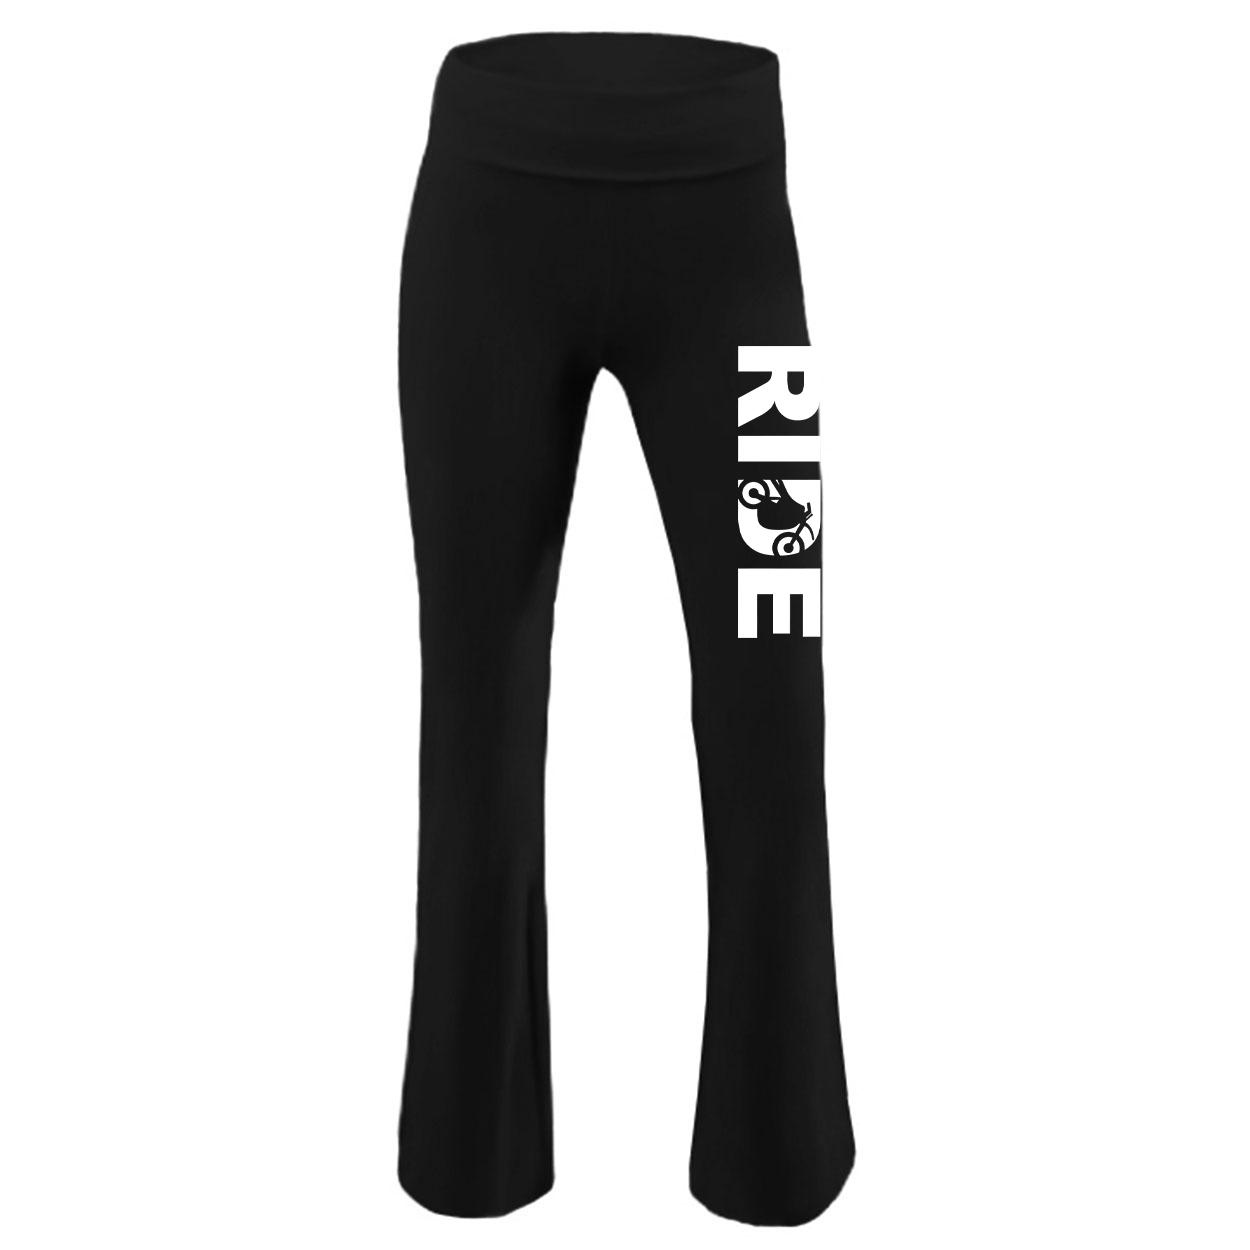 Ride Moto Logo Classic Youth Girls Yoga Pants Black (White Logo)